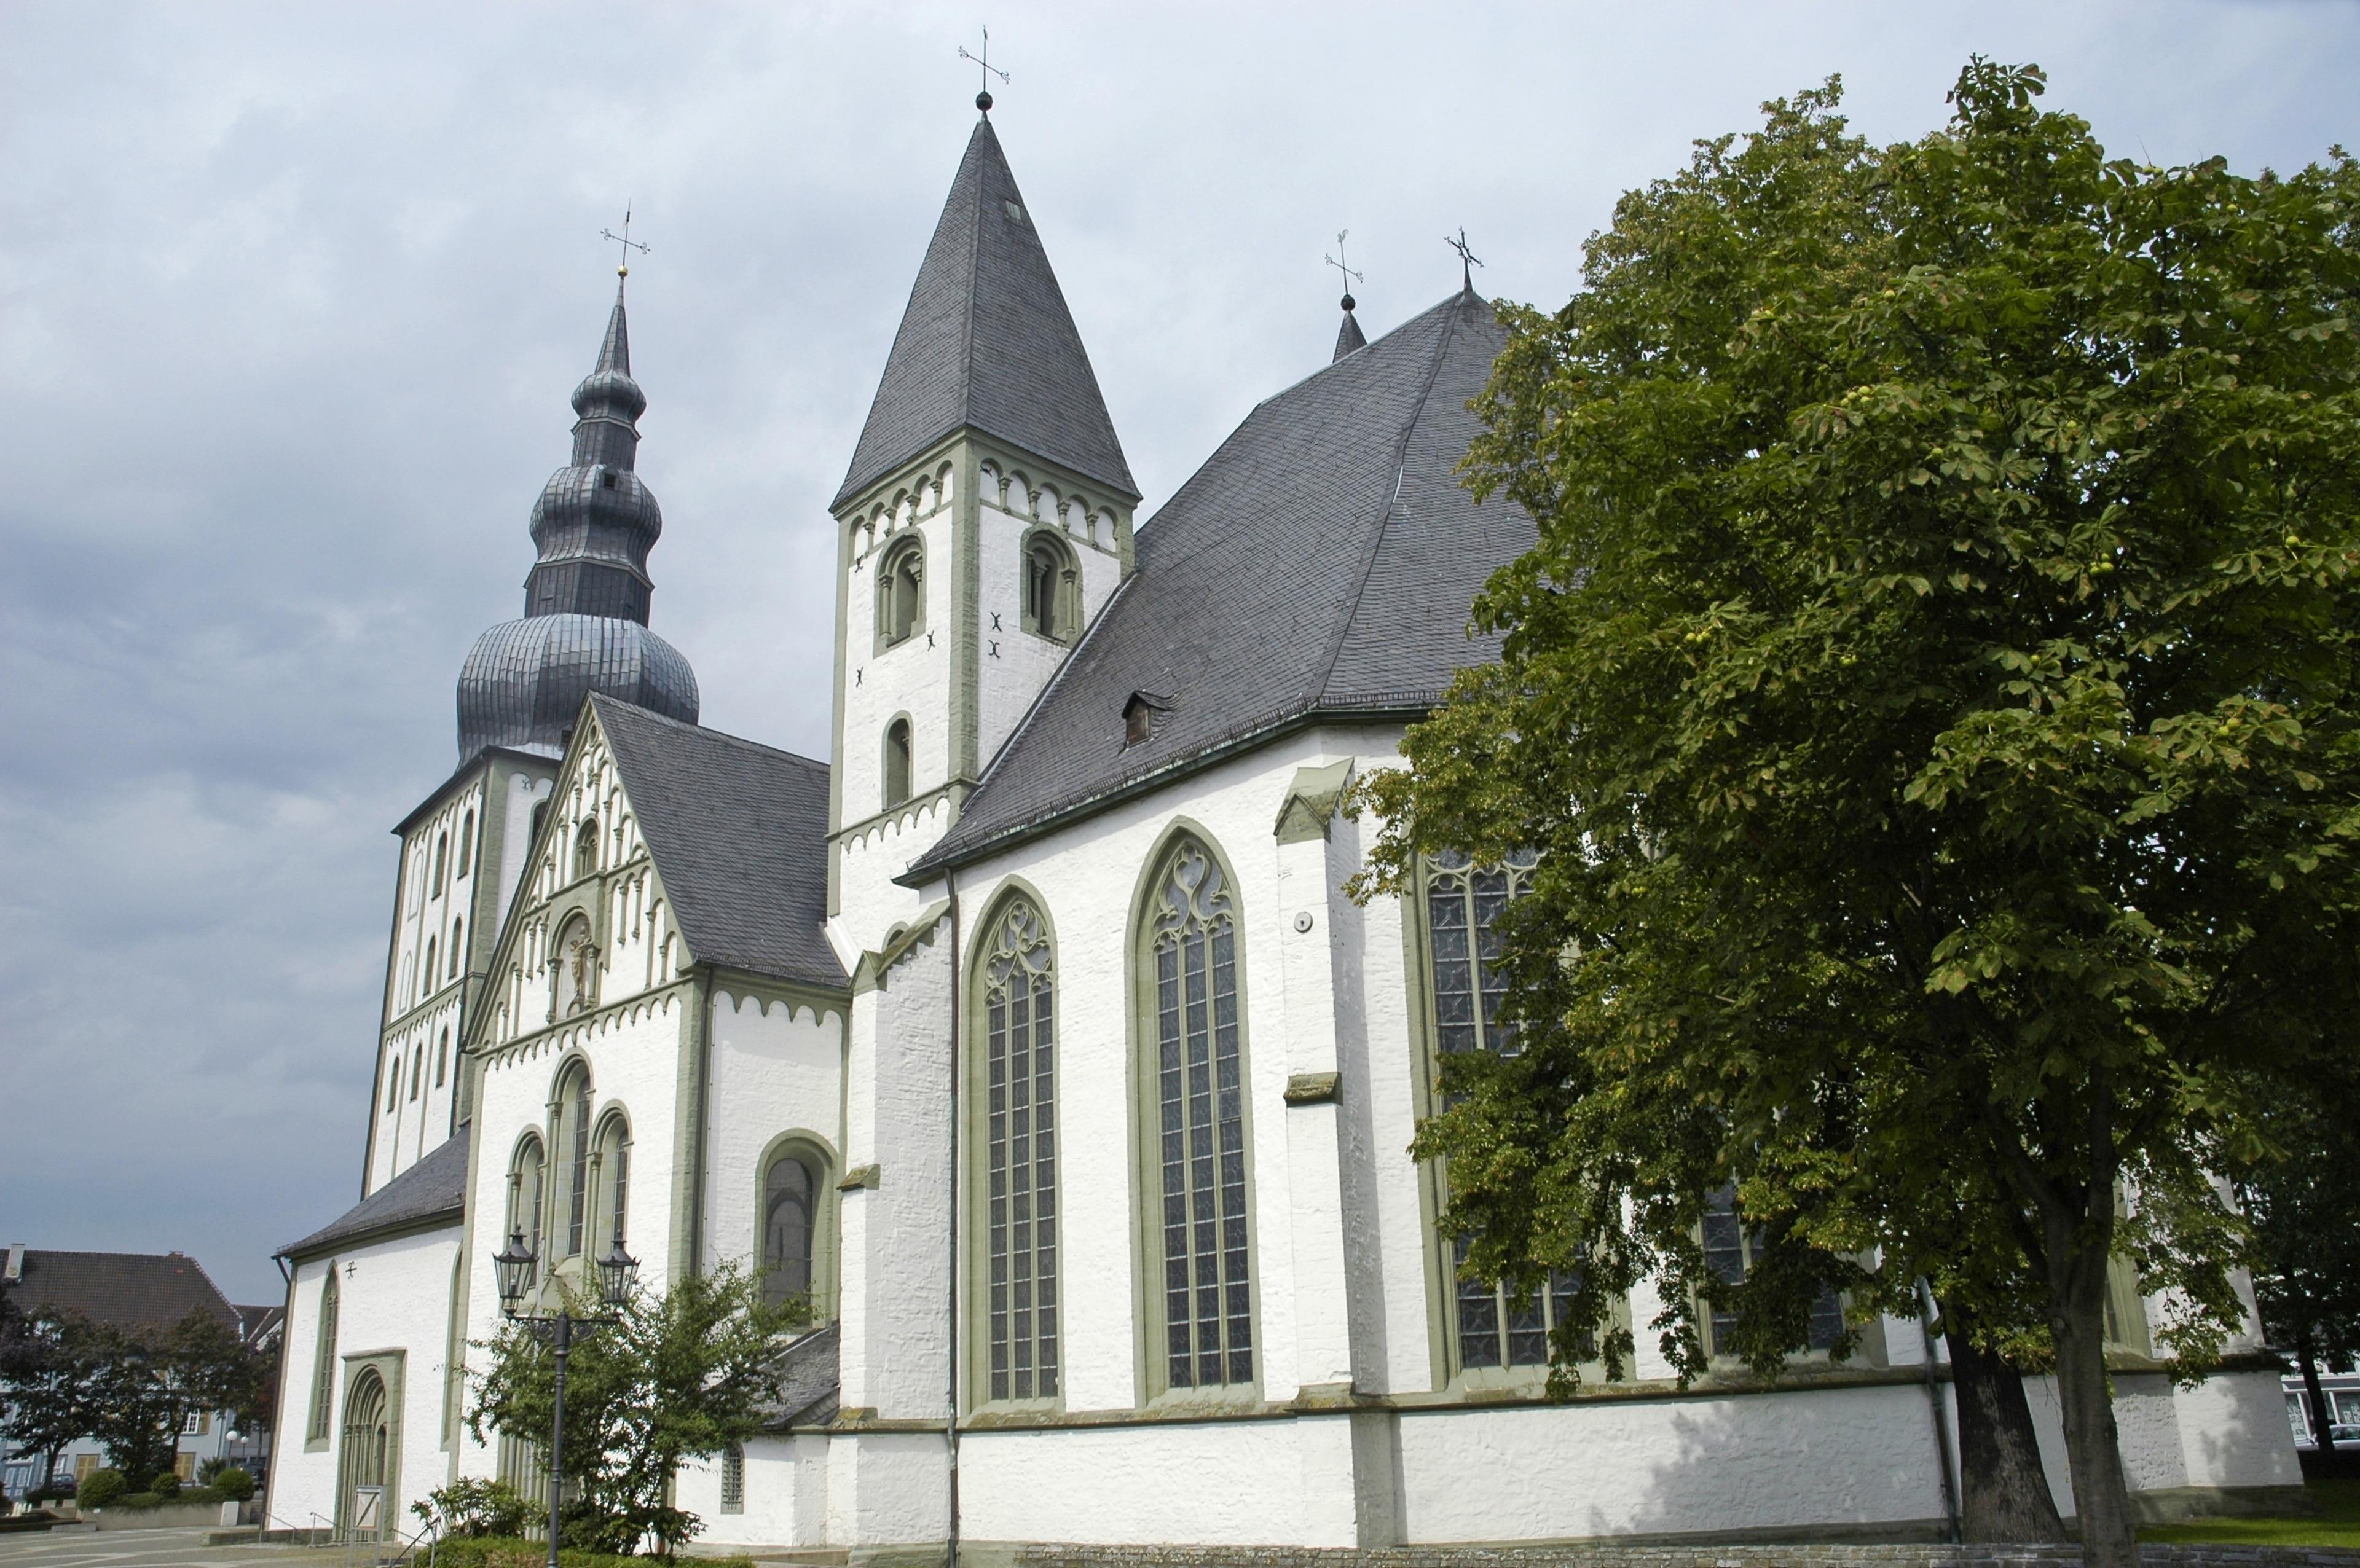 Lippstadt, Renania del Norte-Westfalia, Alemania